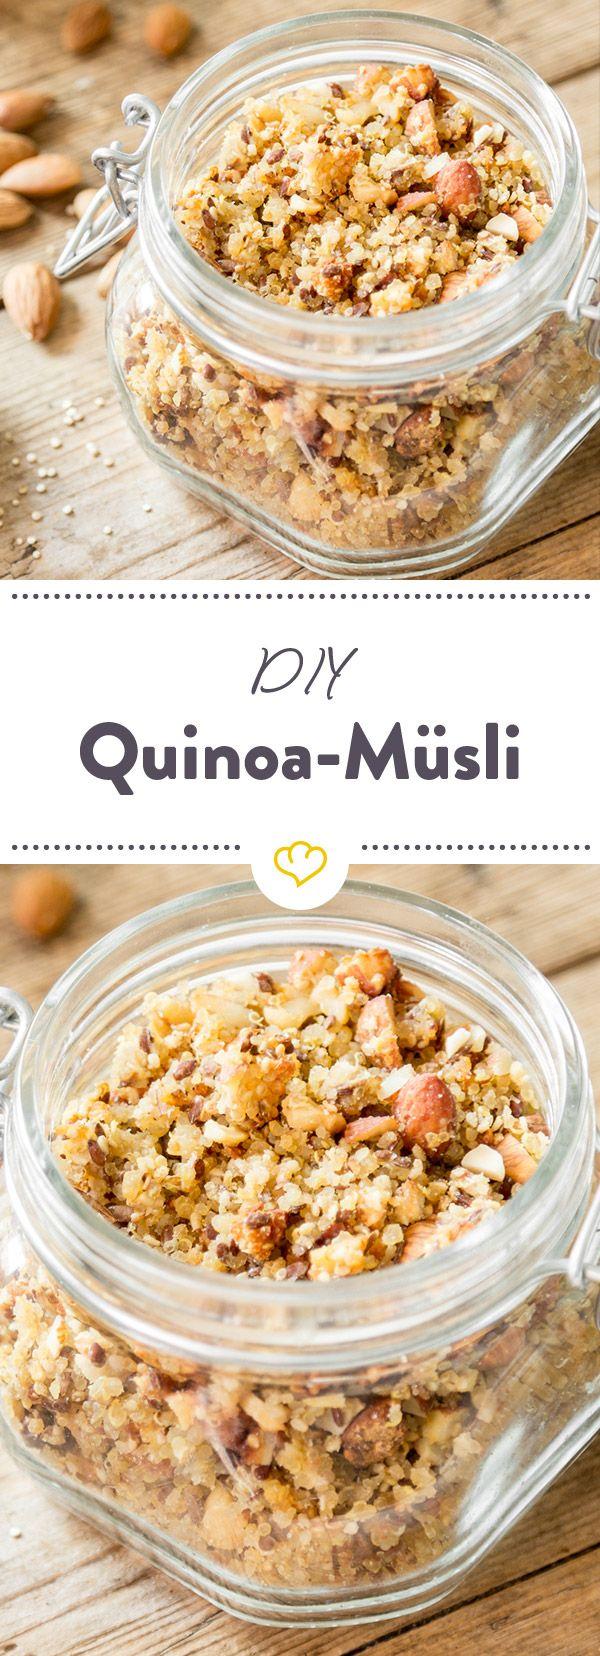 Photo of Superfood for breakfast: quinoa in muesli